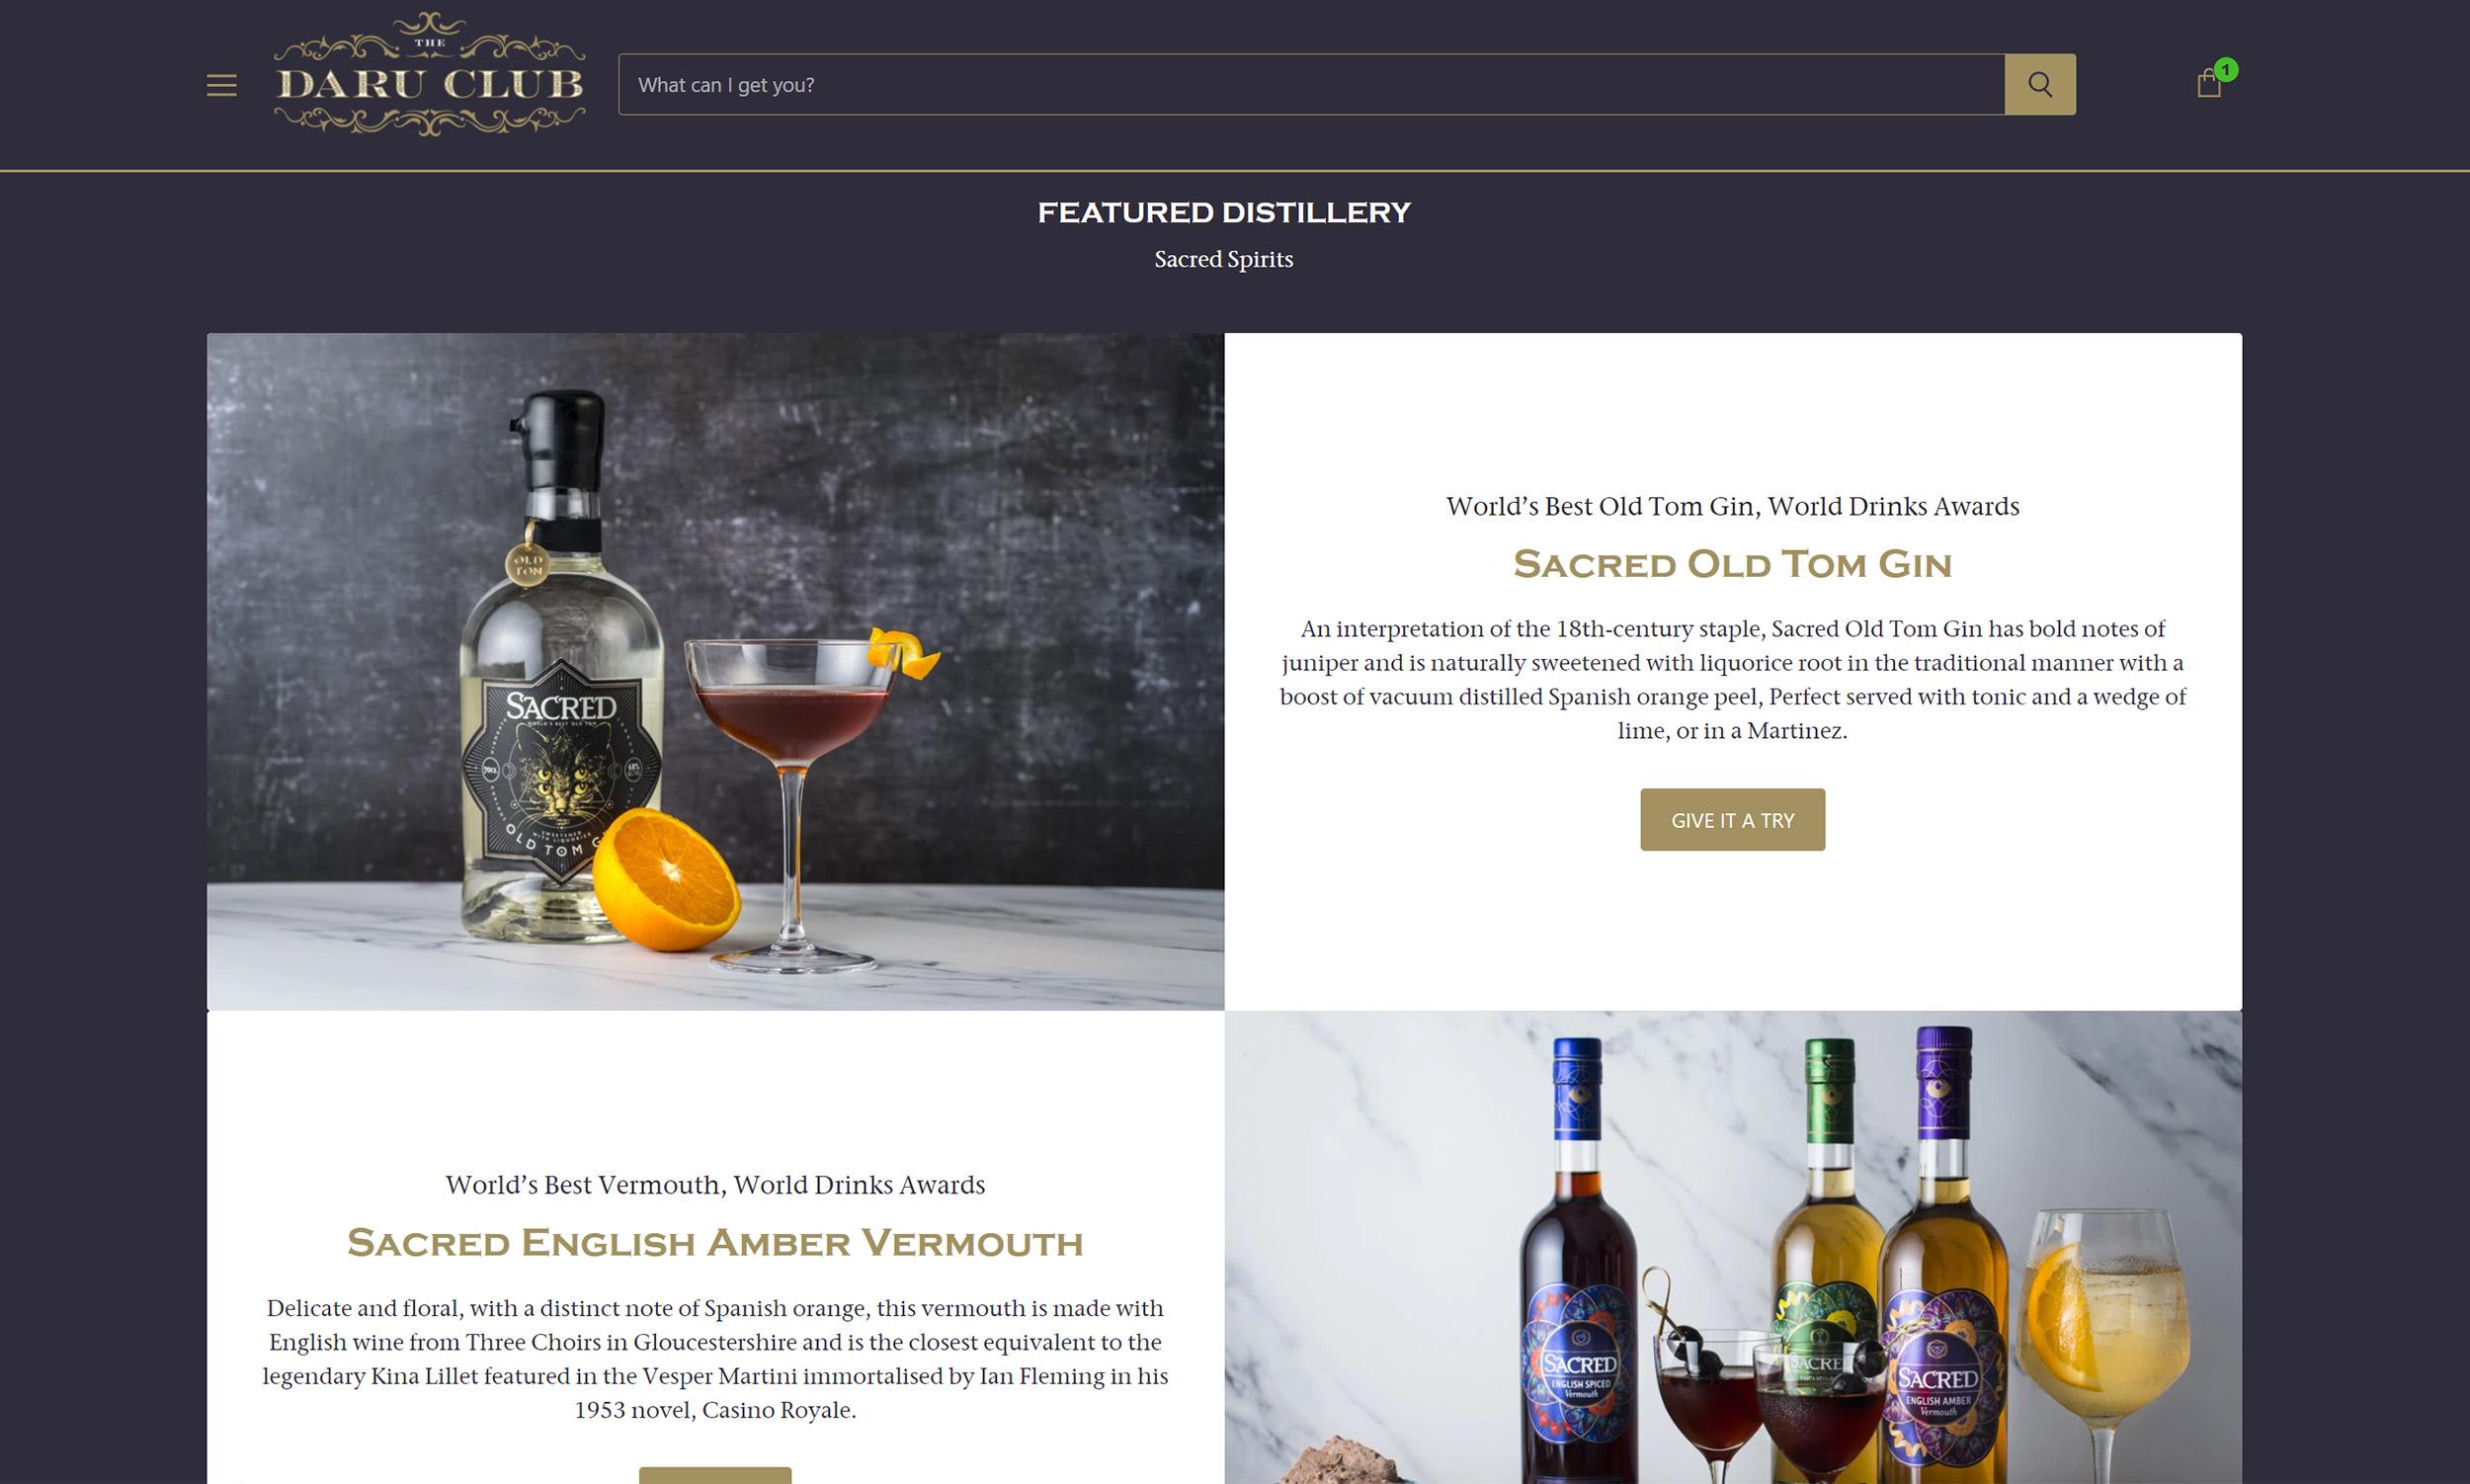 ecommerce-website-design-daru2-farnborough-DGTL